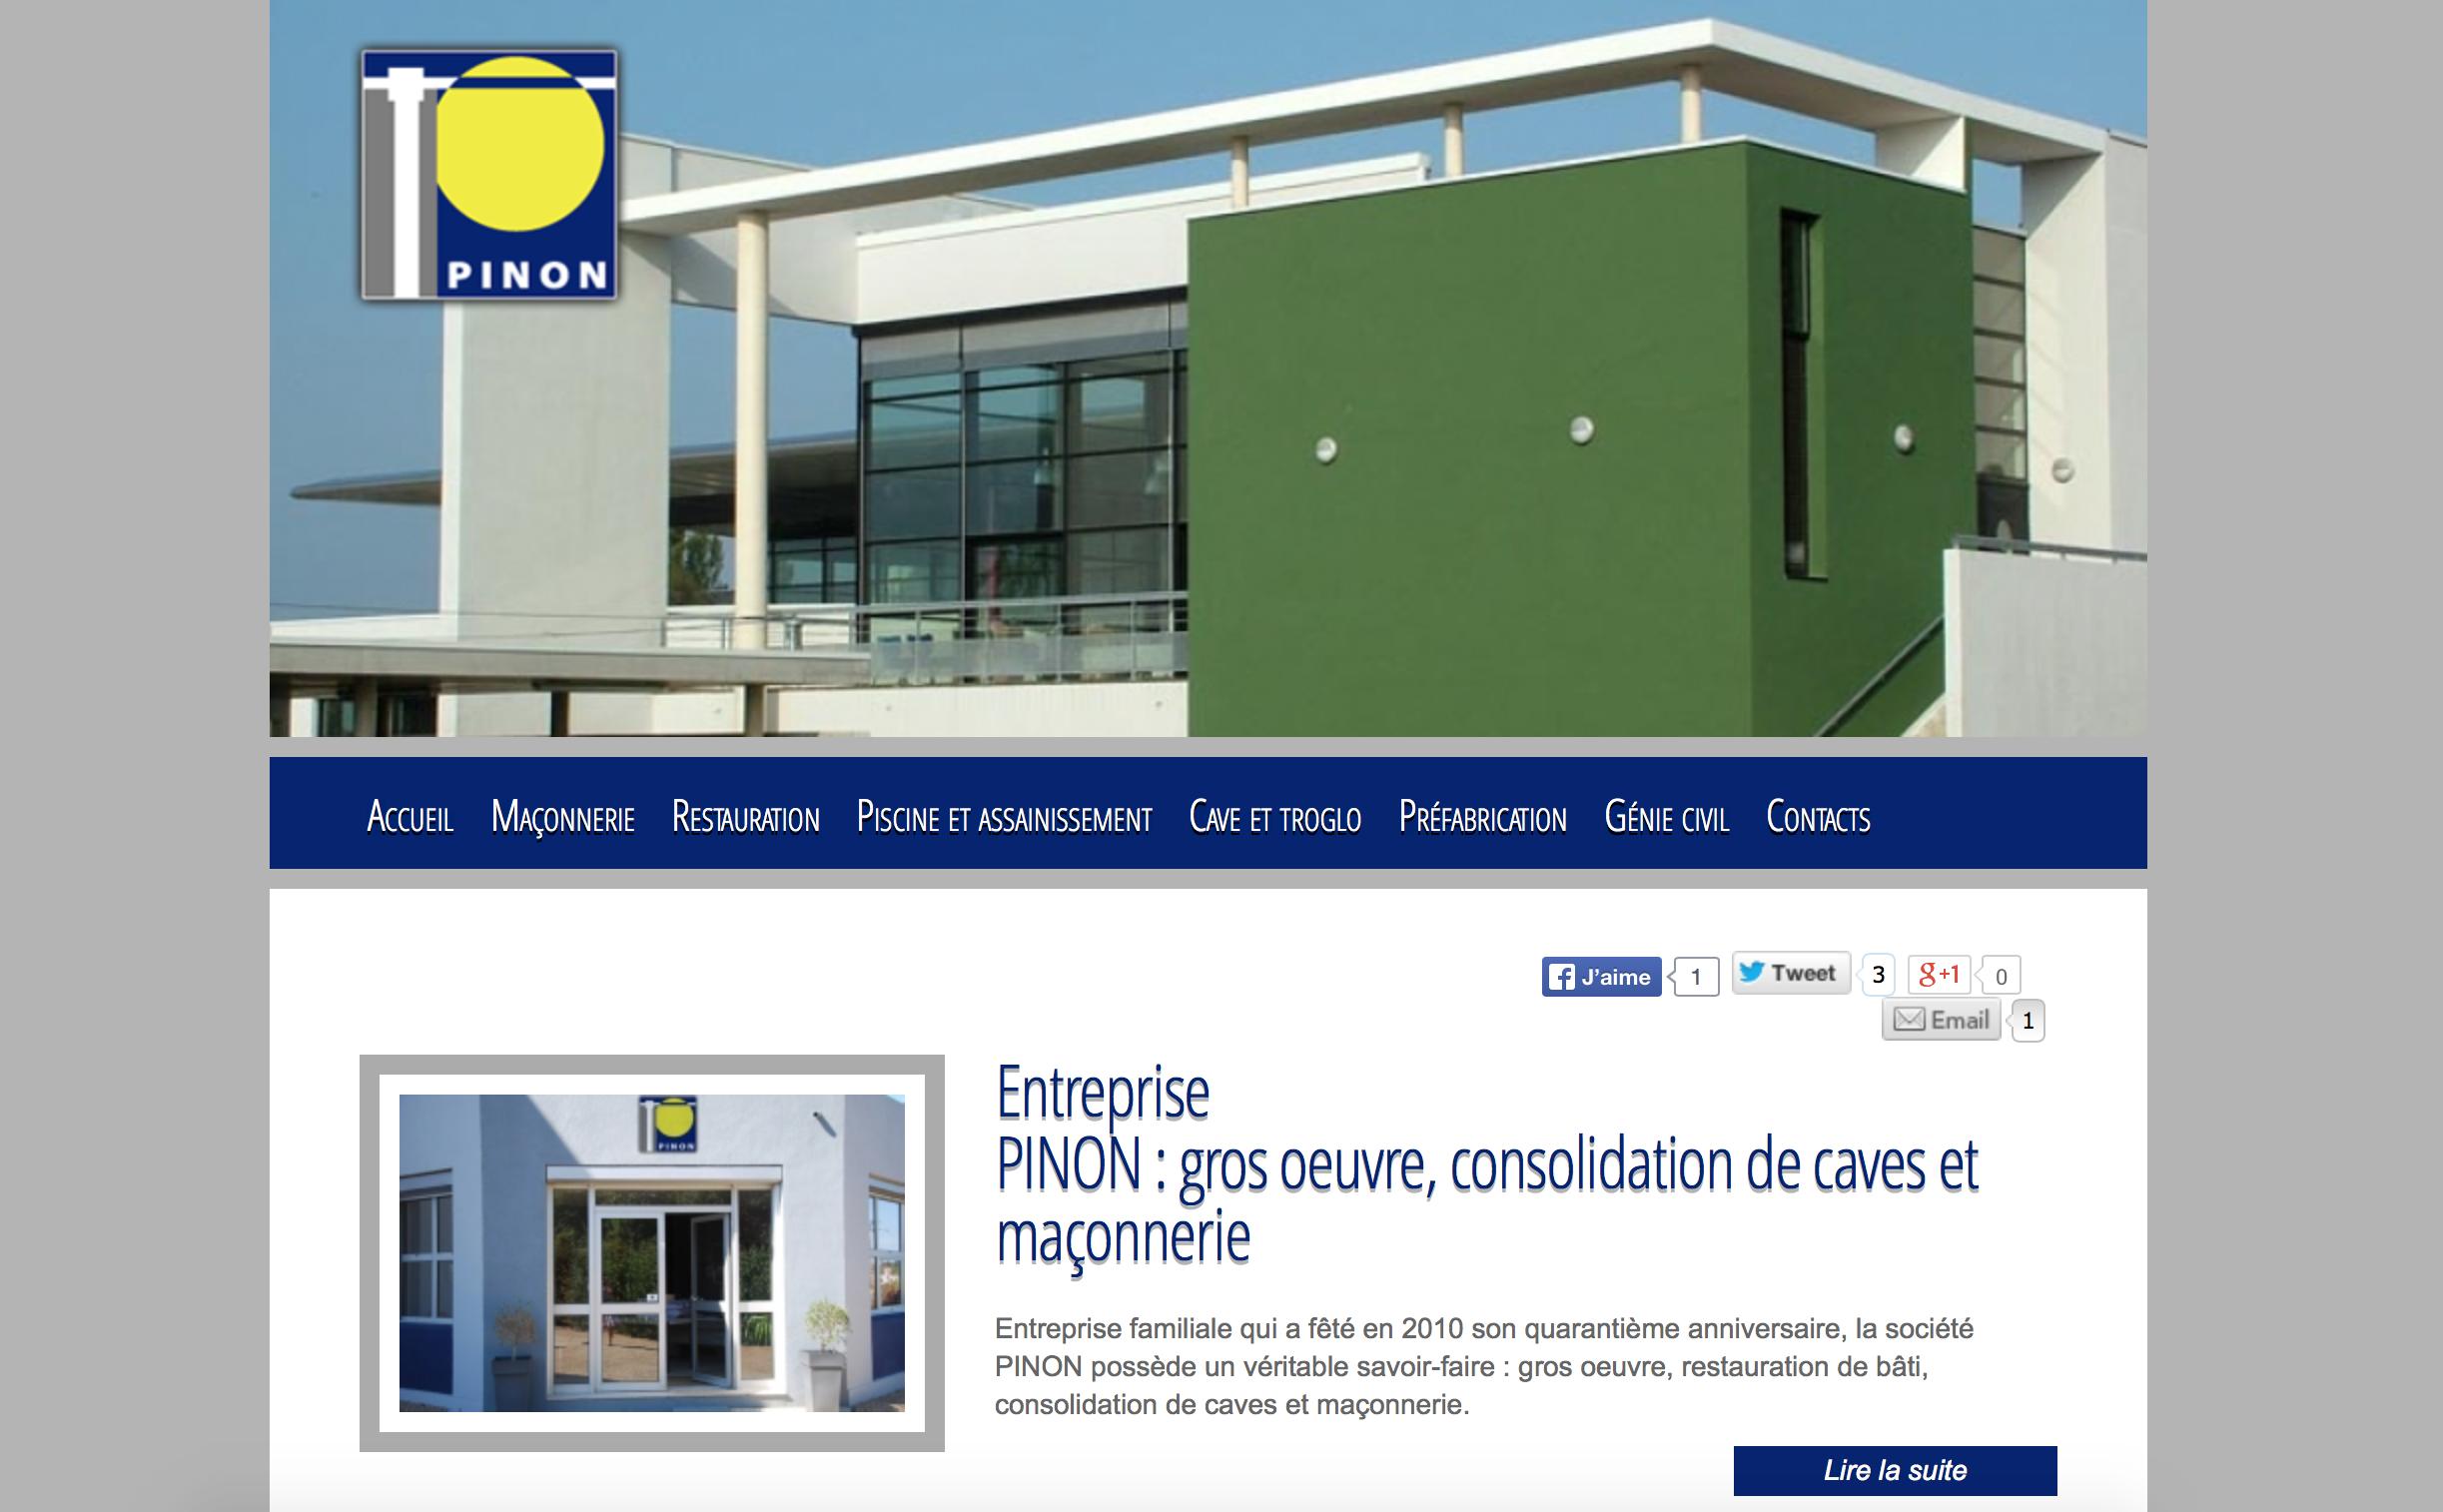 Pinon SA